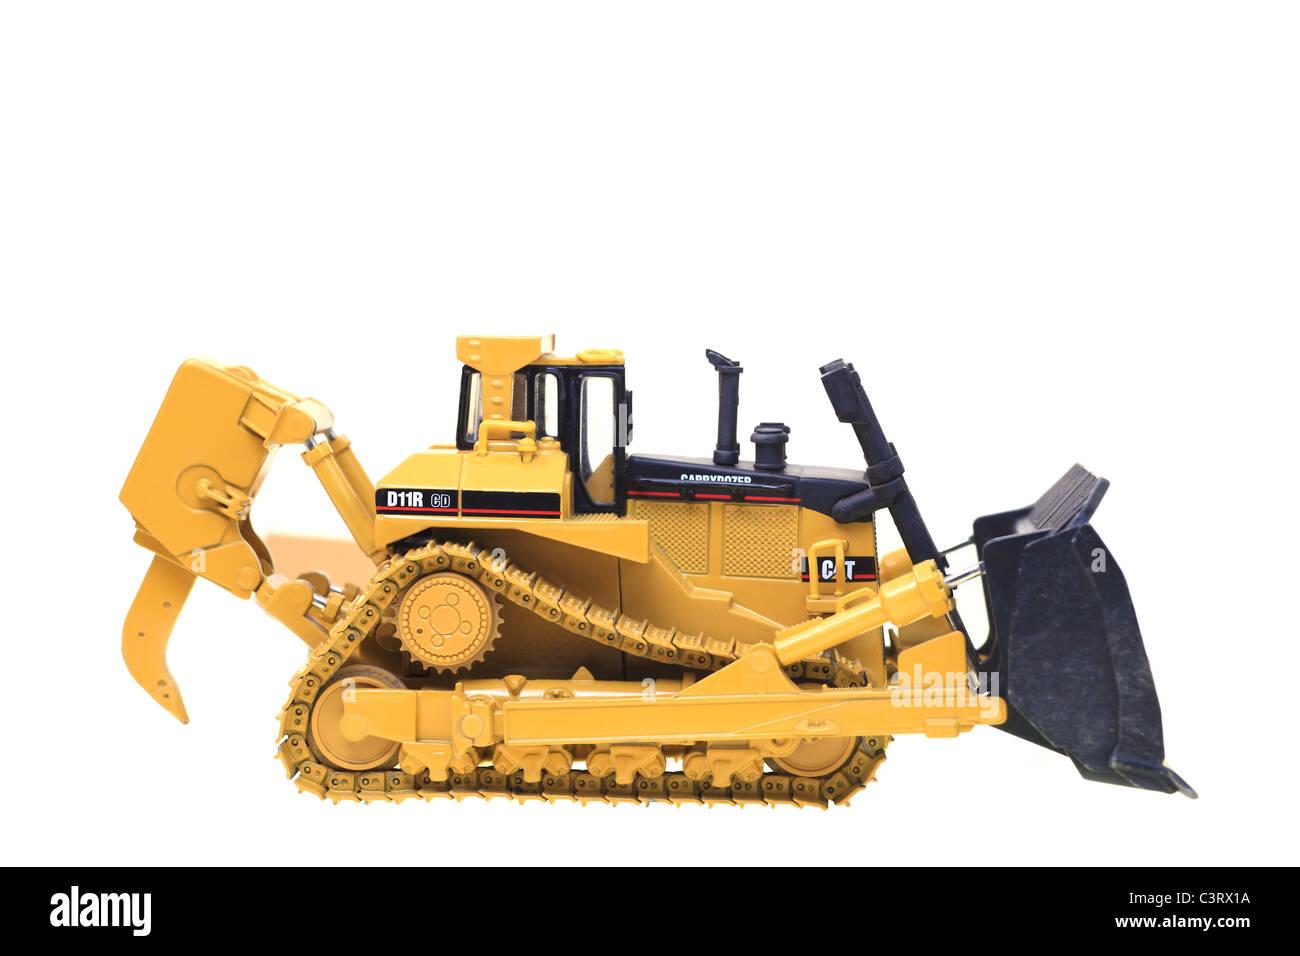 Die cast model of Caterpillar D11R Bulldozer - Stock Image